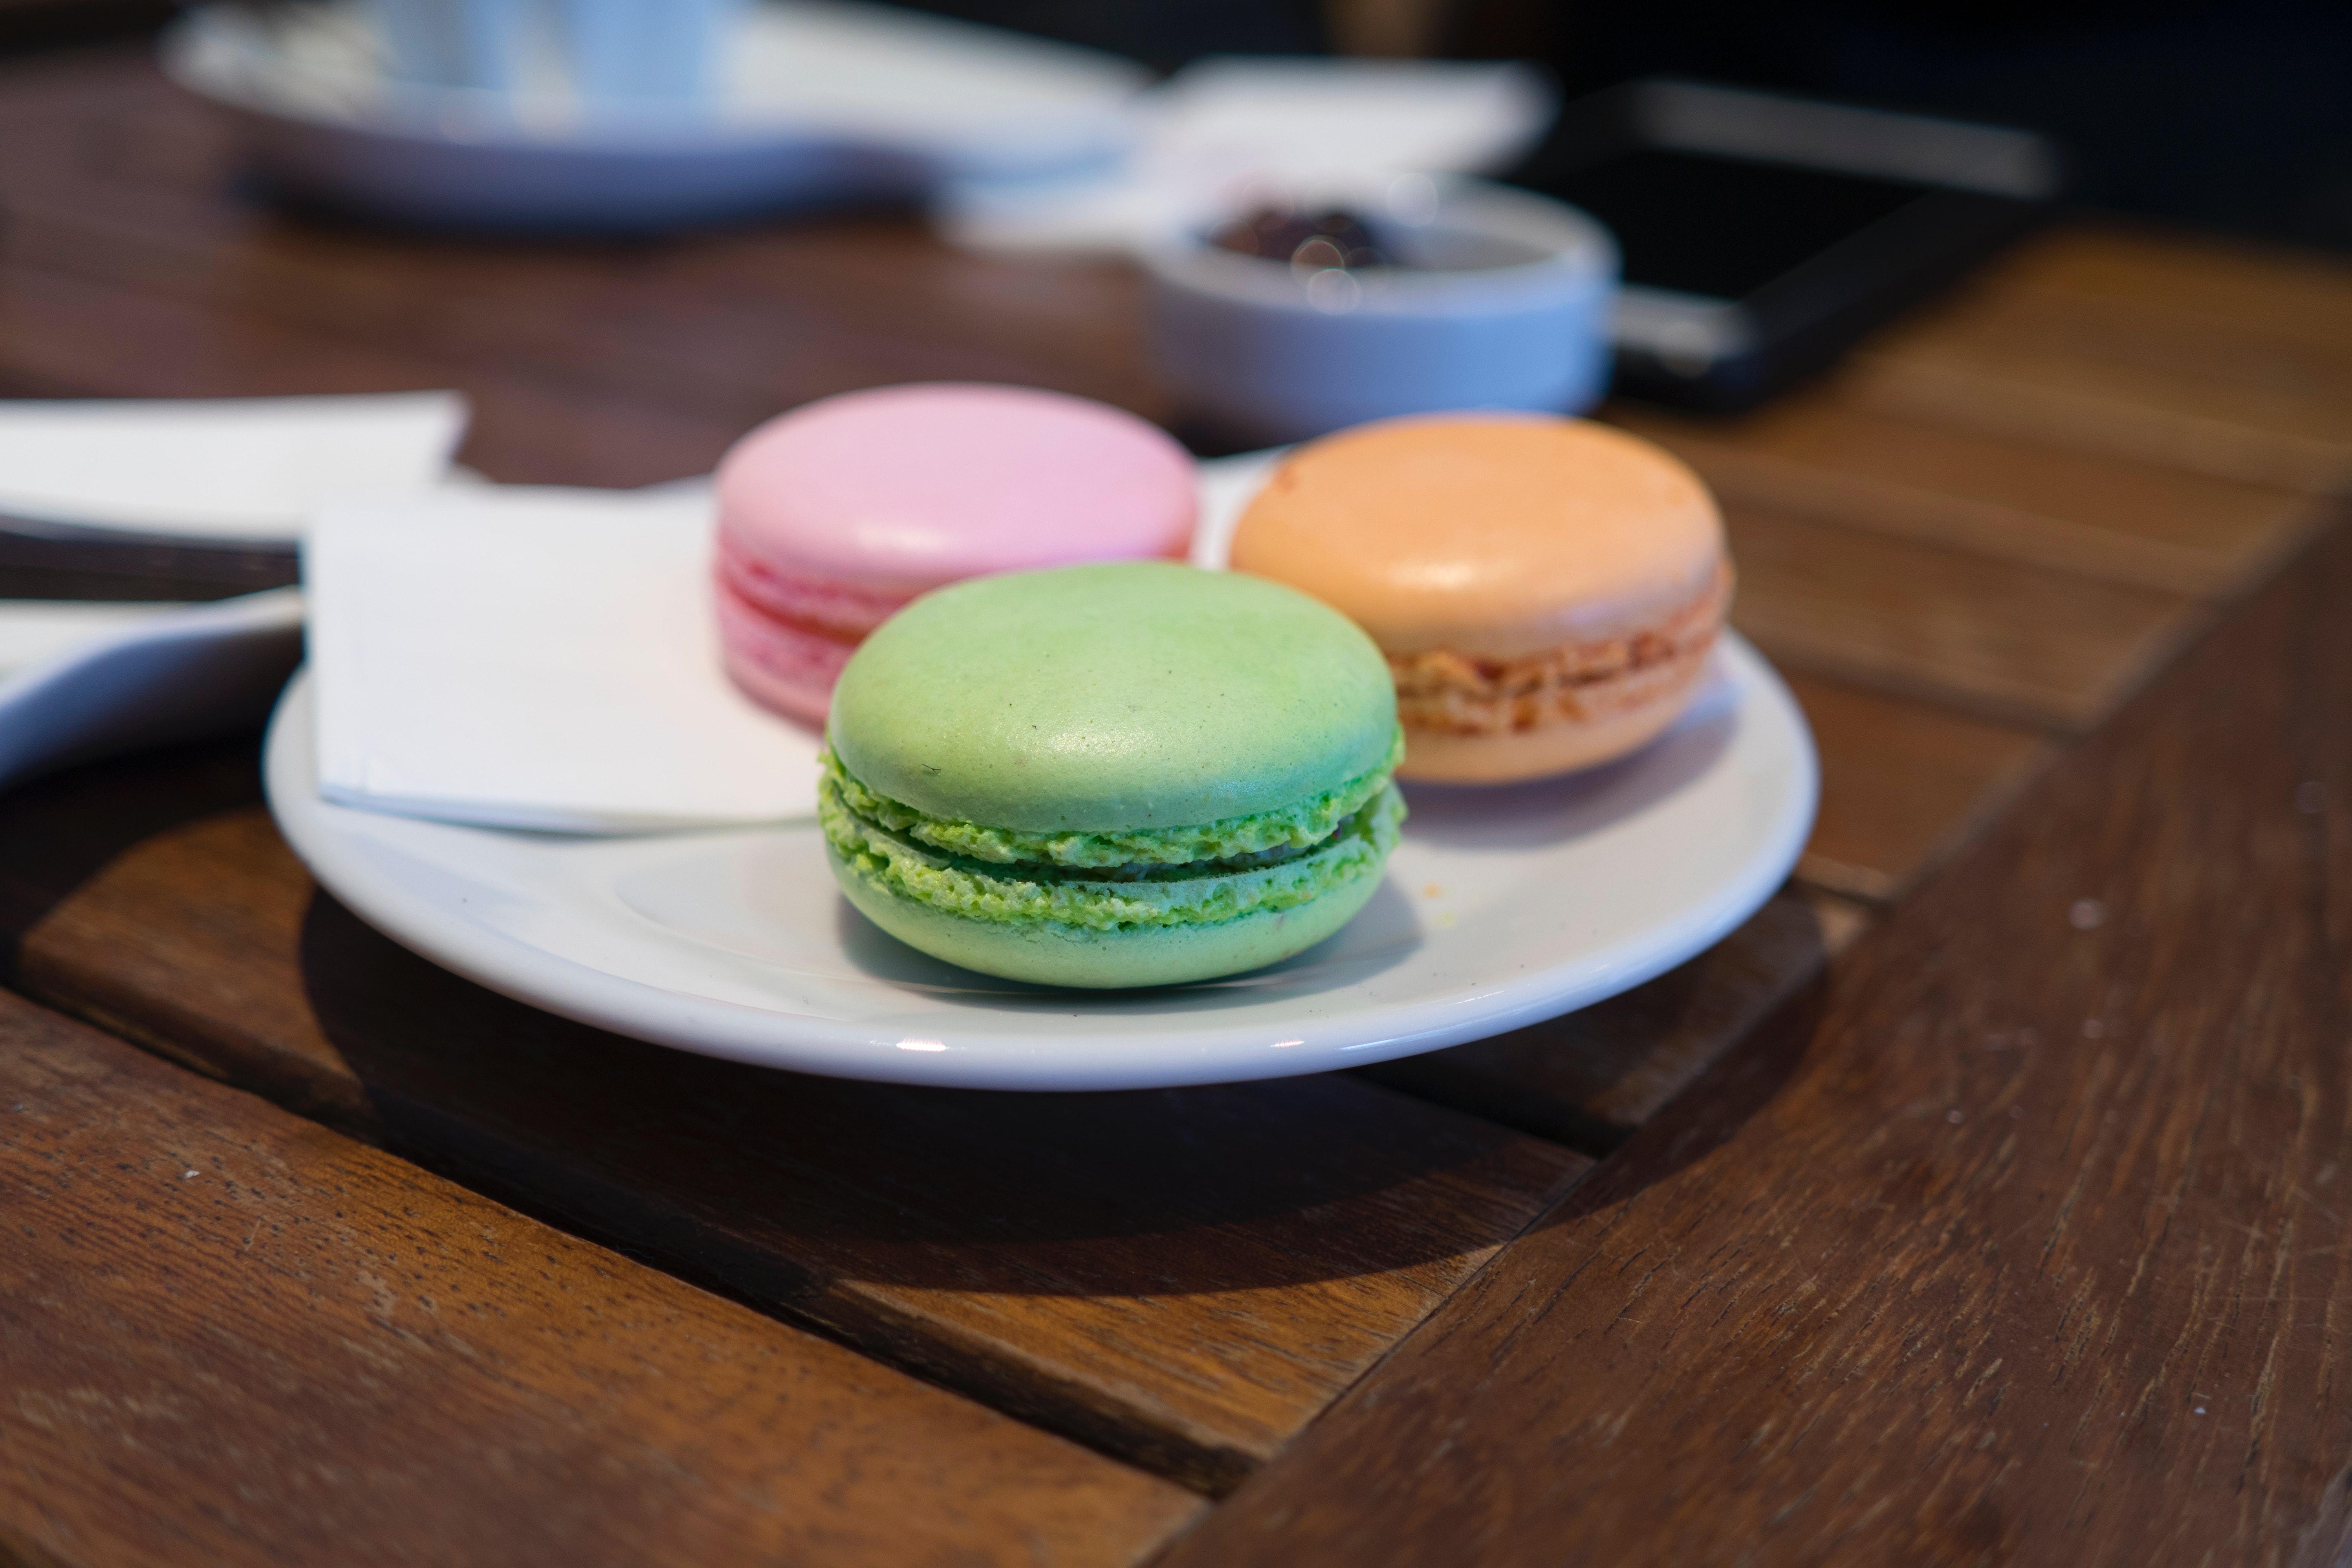 Close-up of Macaroons, Bake, Indoors, Wood, Tableware, HQ Photo